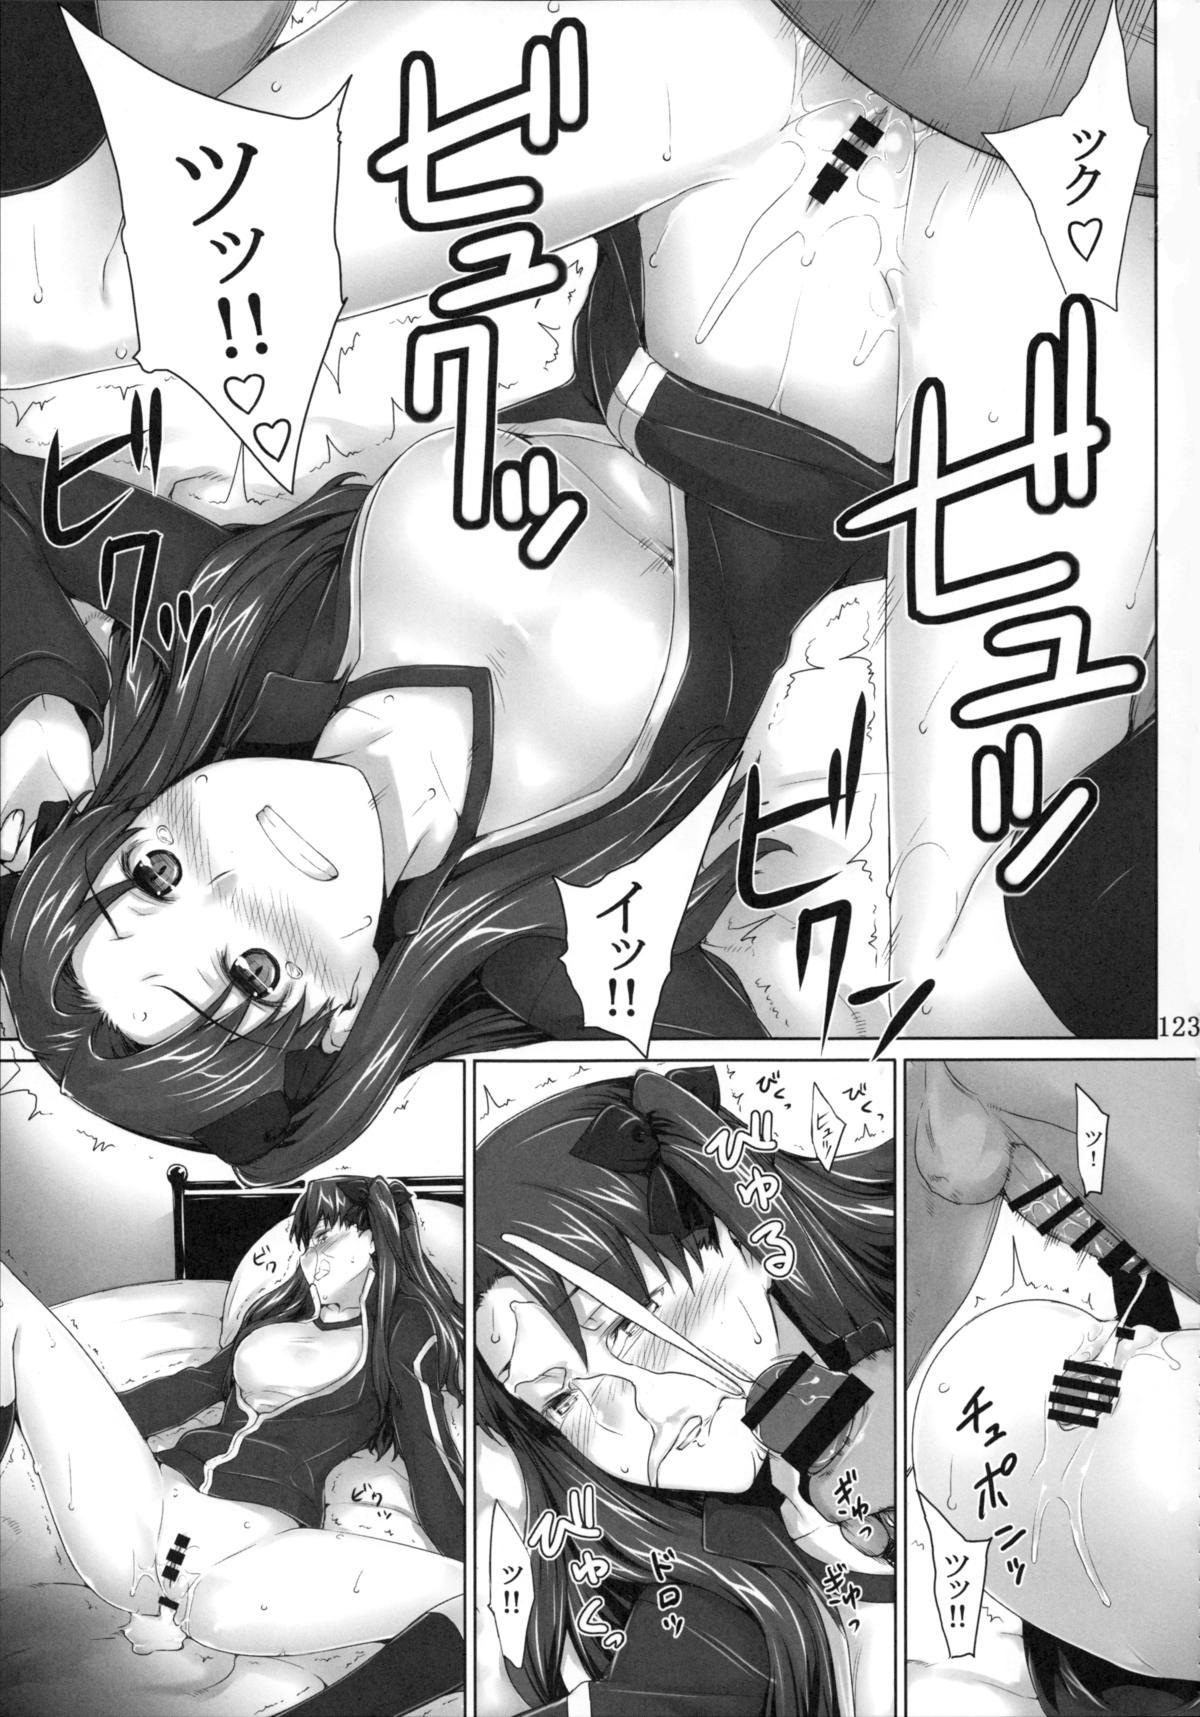 Tosaka-ke no Kakei Jijou Soushuuhen 1 122